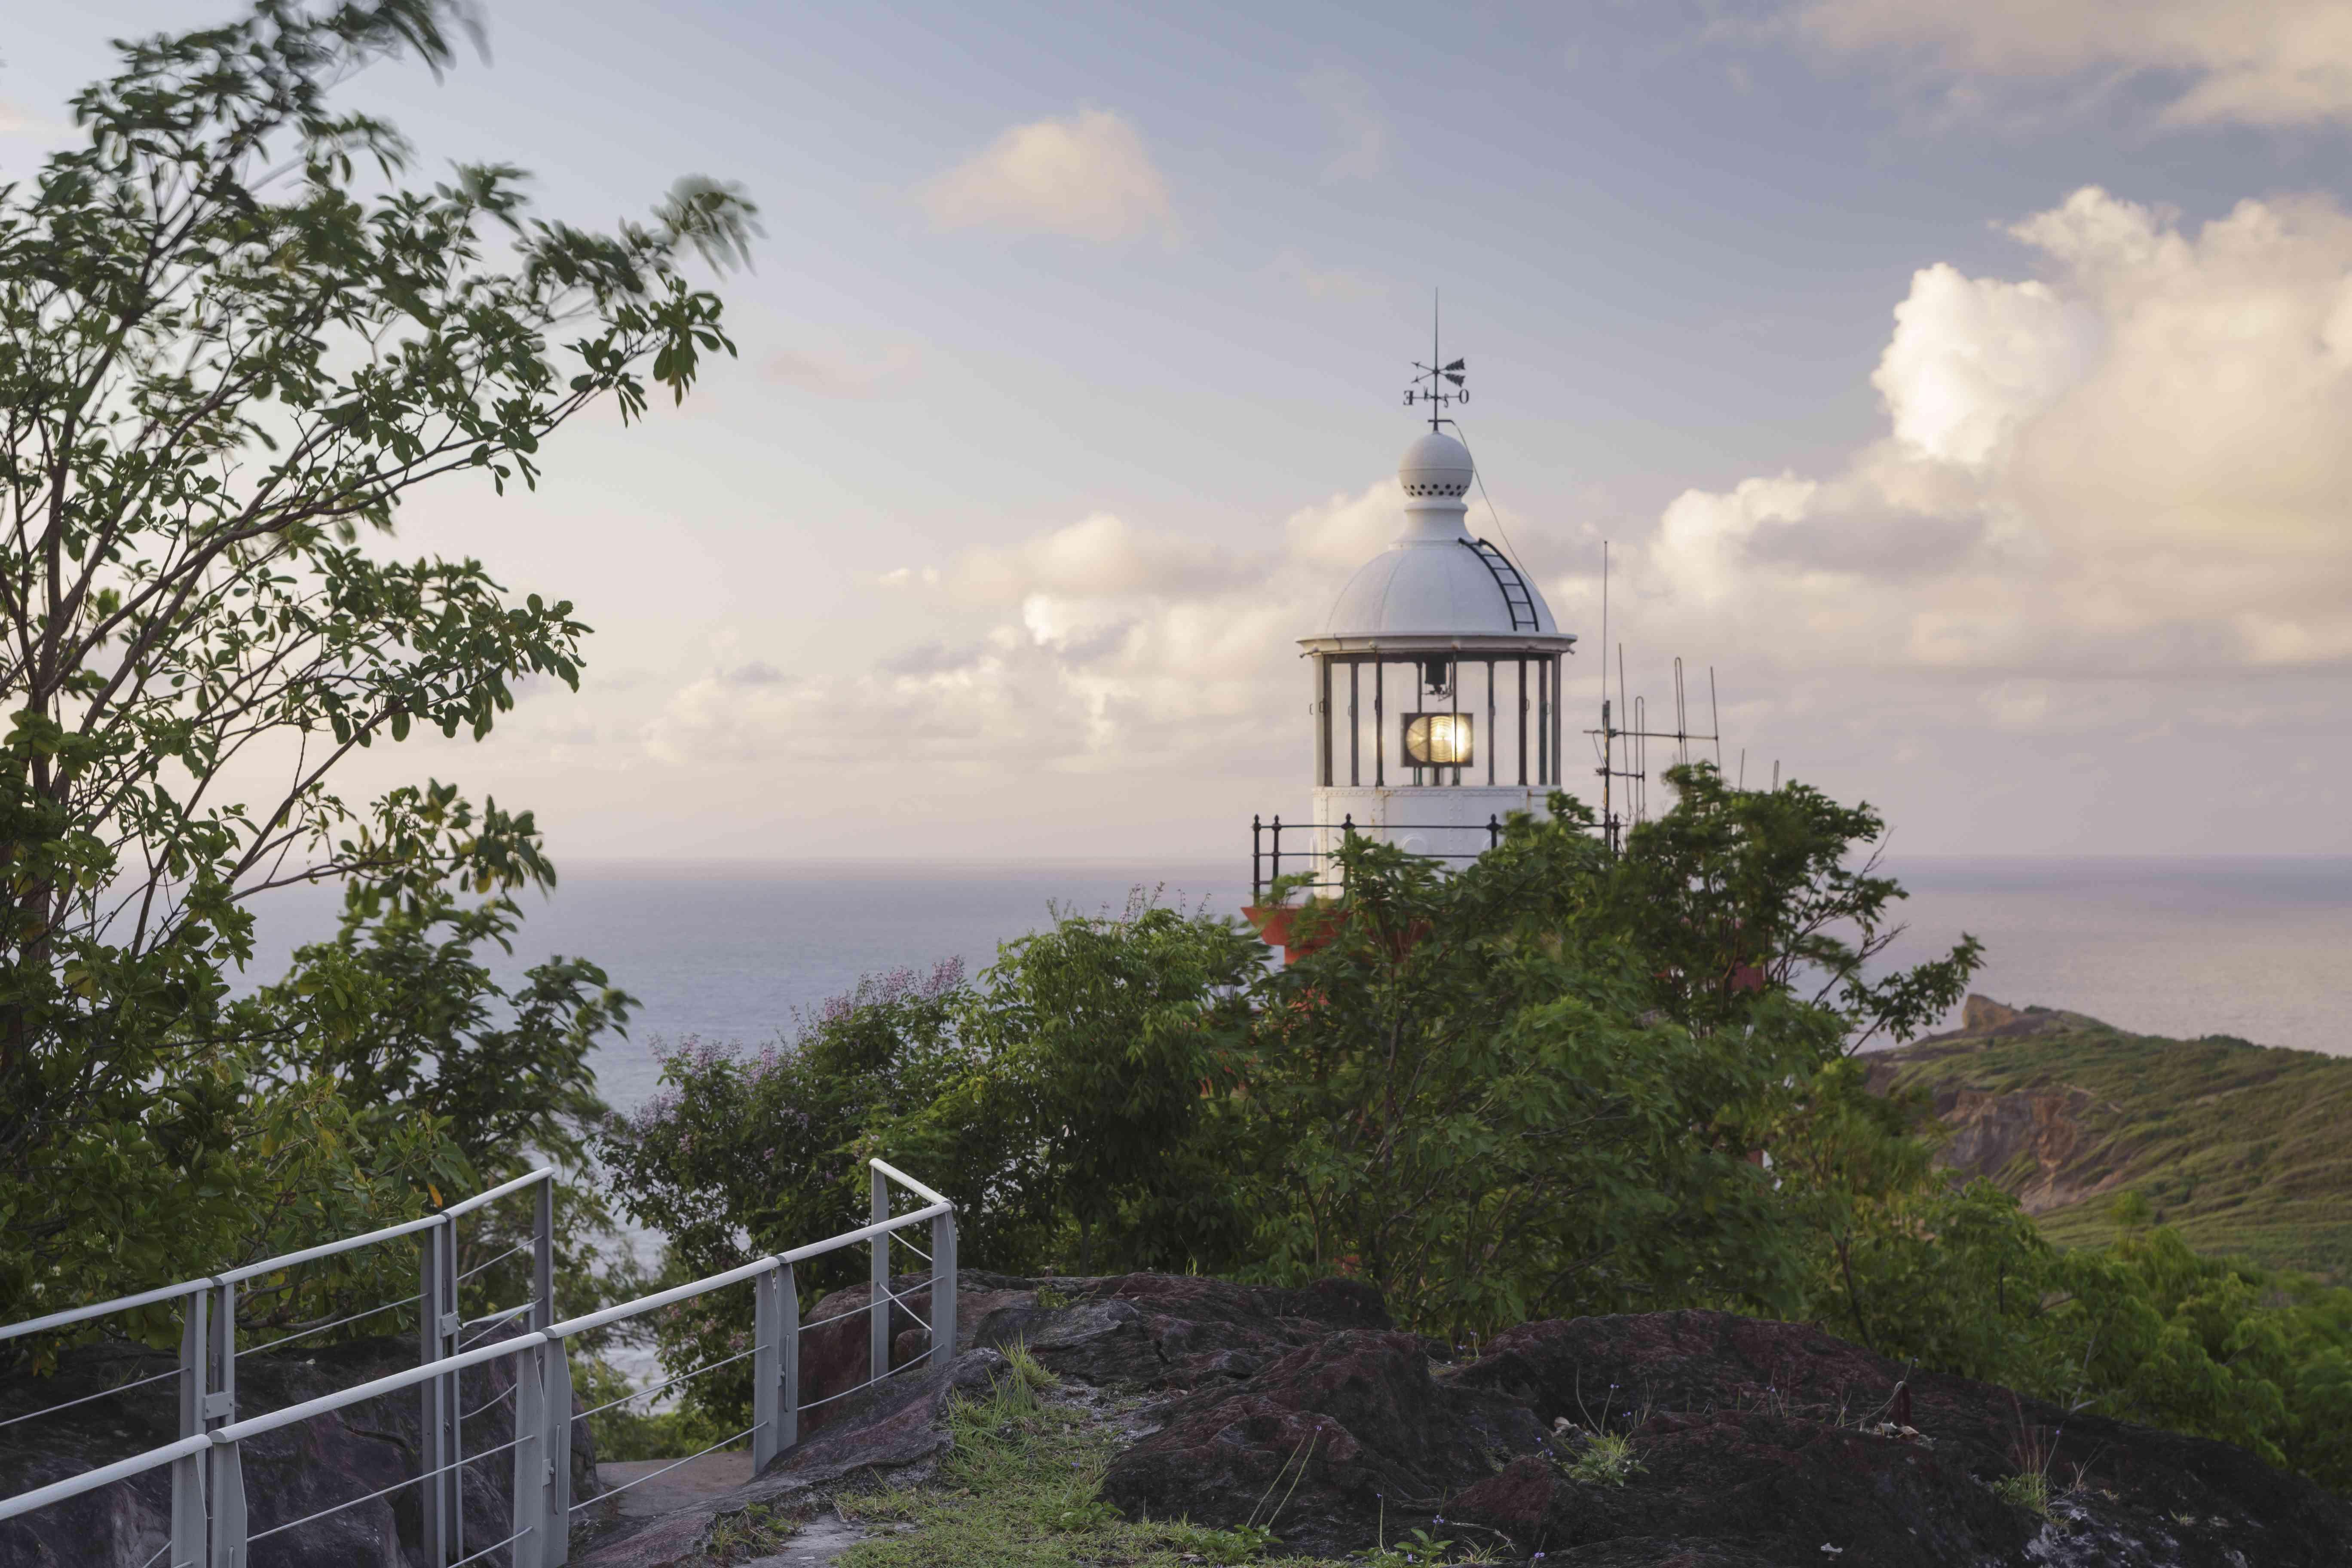 Caravelle Lighthouse on the Cara-Ile de la Caravell, Martinique.